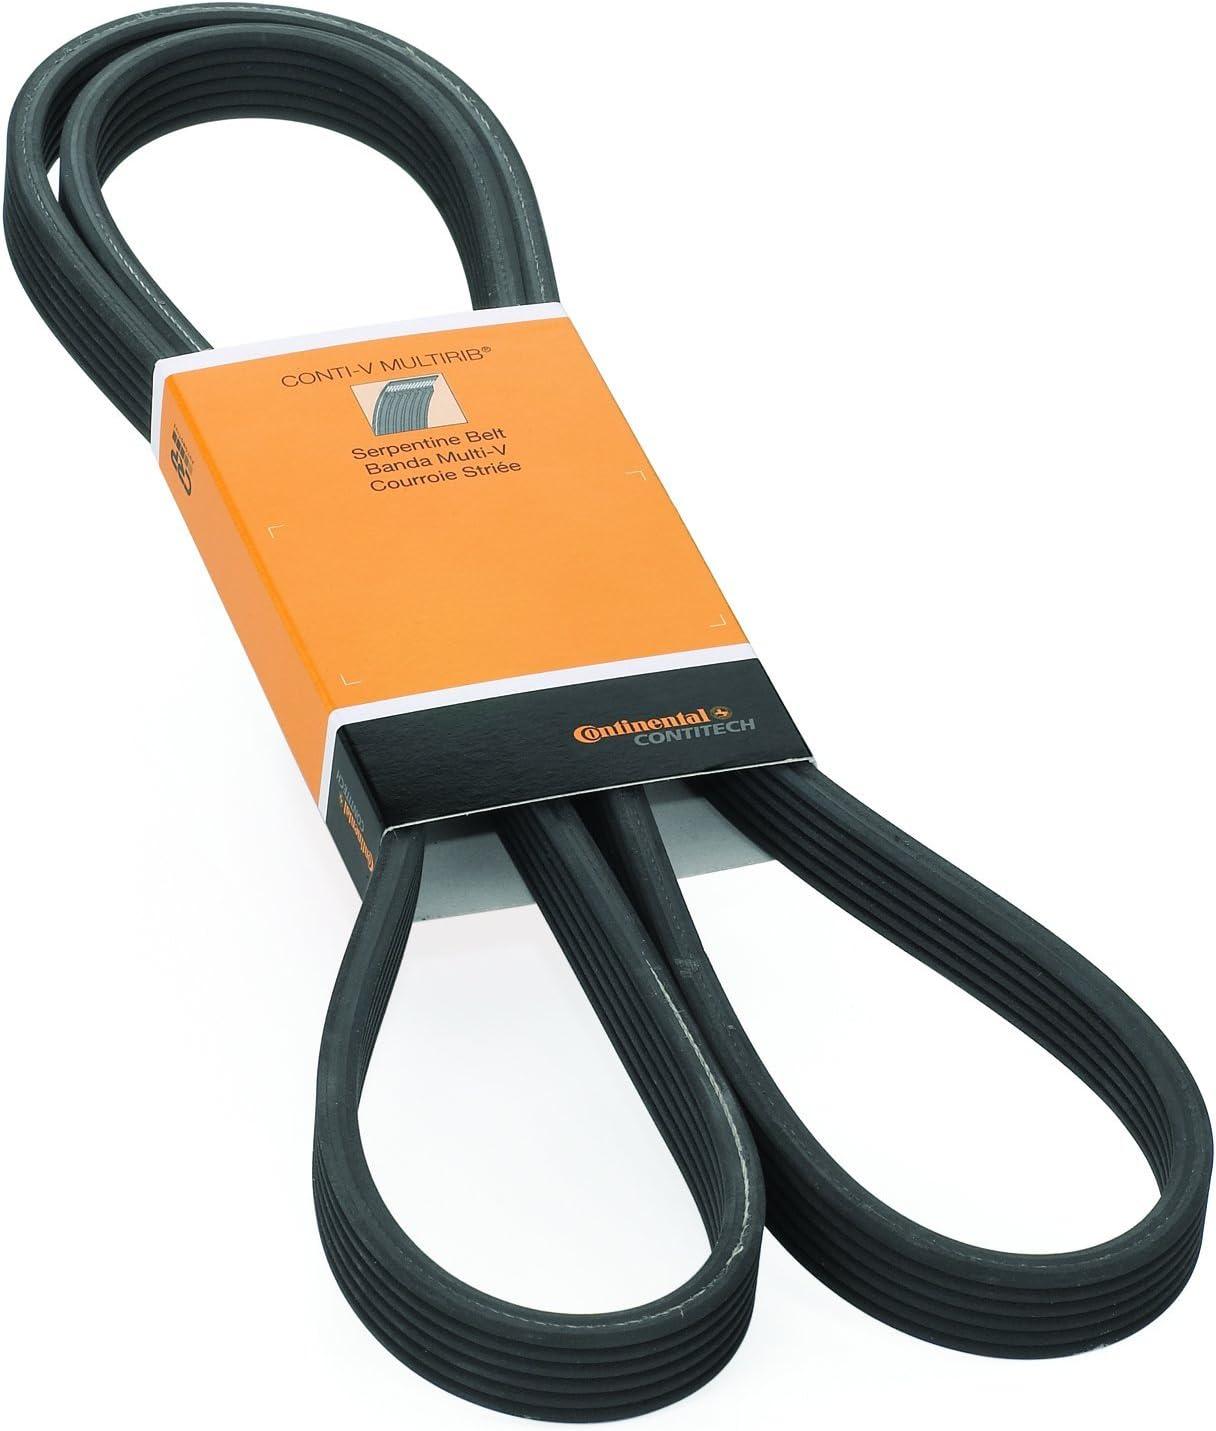 ContiTech PK060882 Purchase Gifts Serpentine Belt